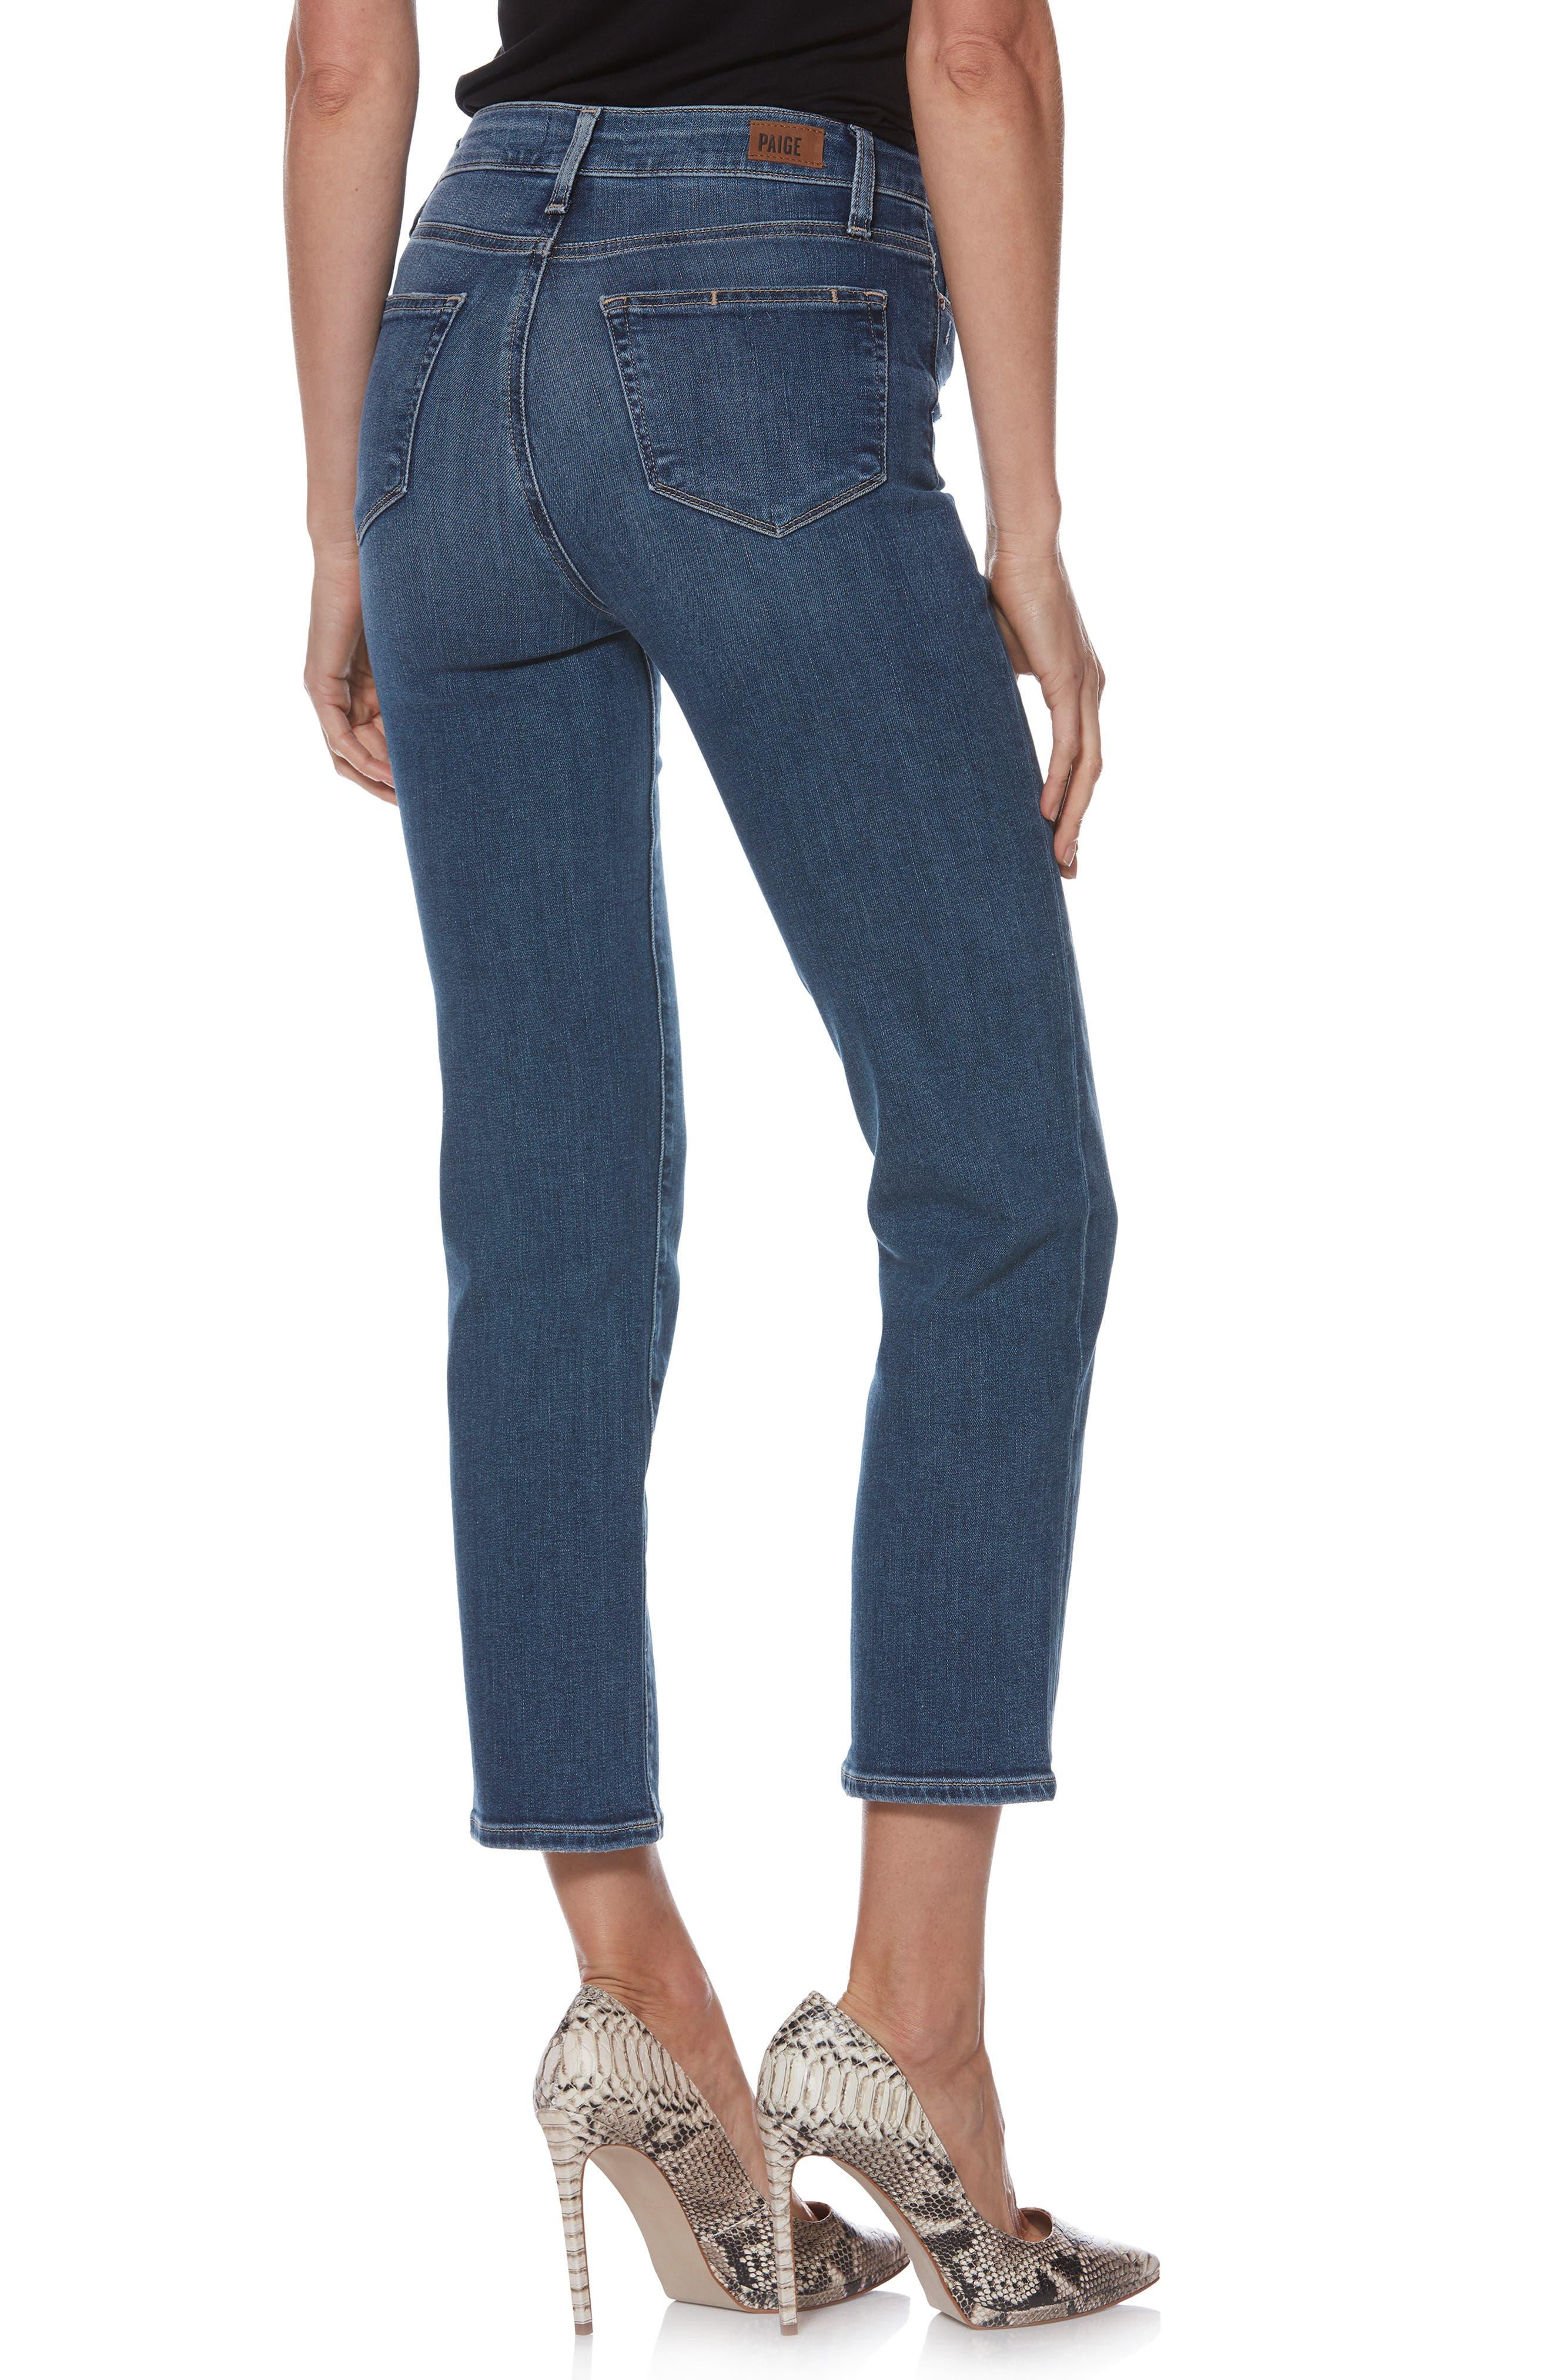 Transcend Vintage - Margot High Waist Ankle Straight Leg Jeans,                             Alternate thumbnail 2, color,                             HANNIE